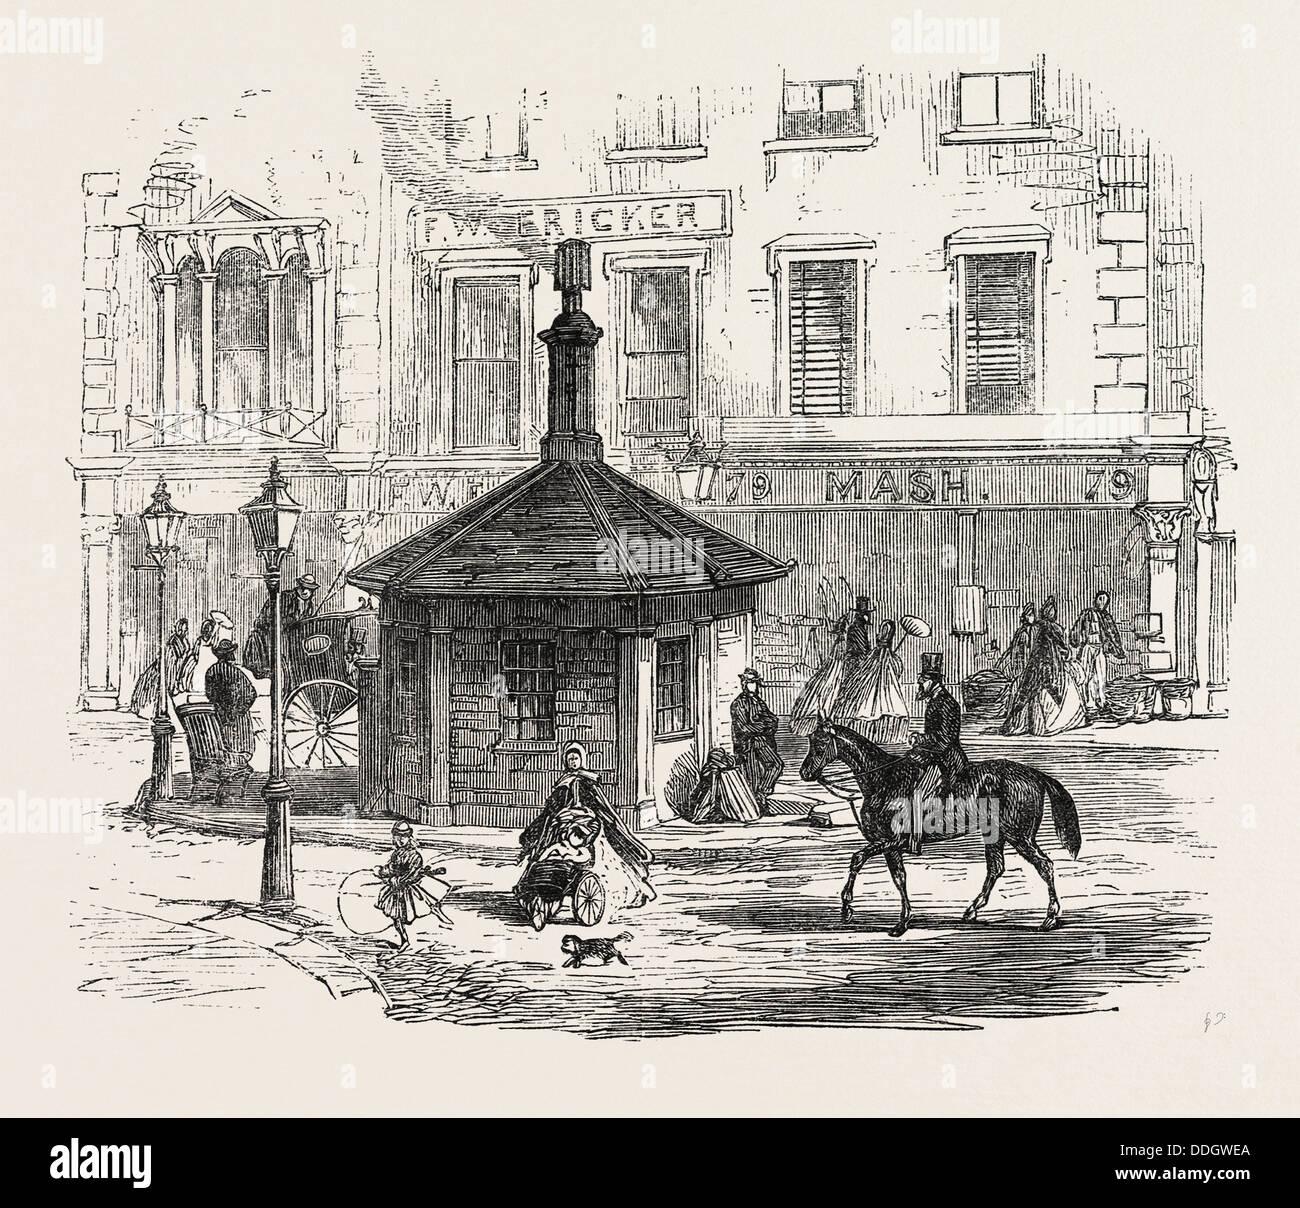 TURNPIKE GATES IN AND NEAR LONDON JUST DEMOLISHED: NOTTING HILL GATE, UK, 1864 Stock Photo